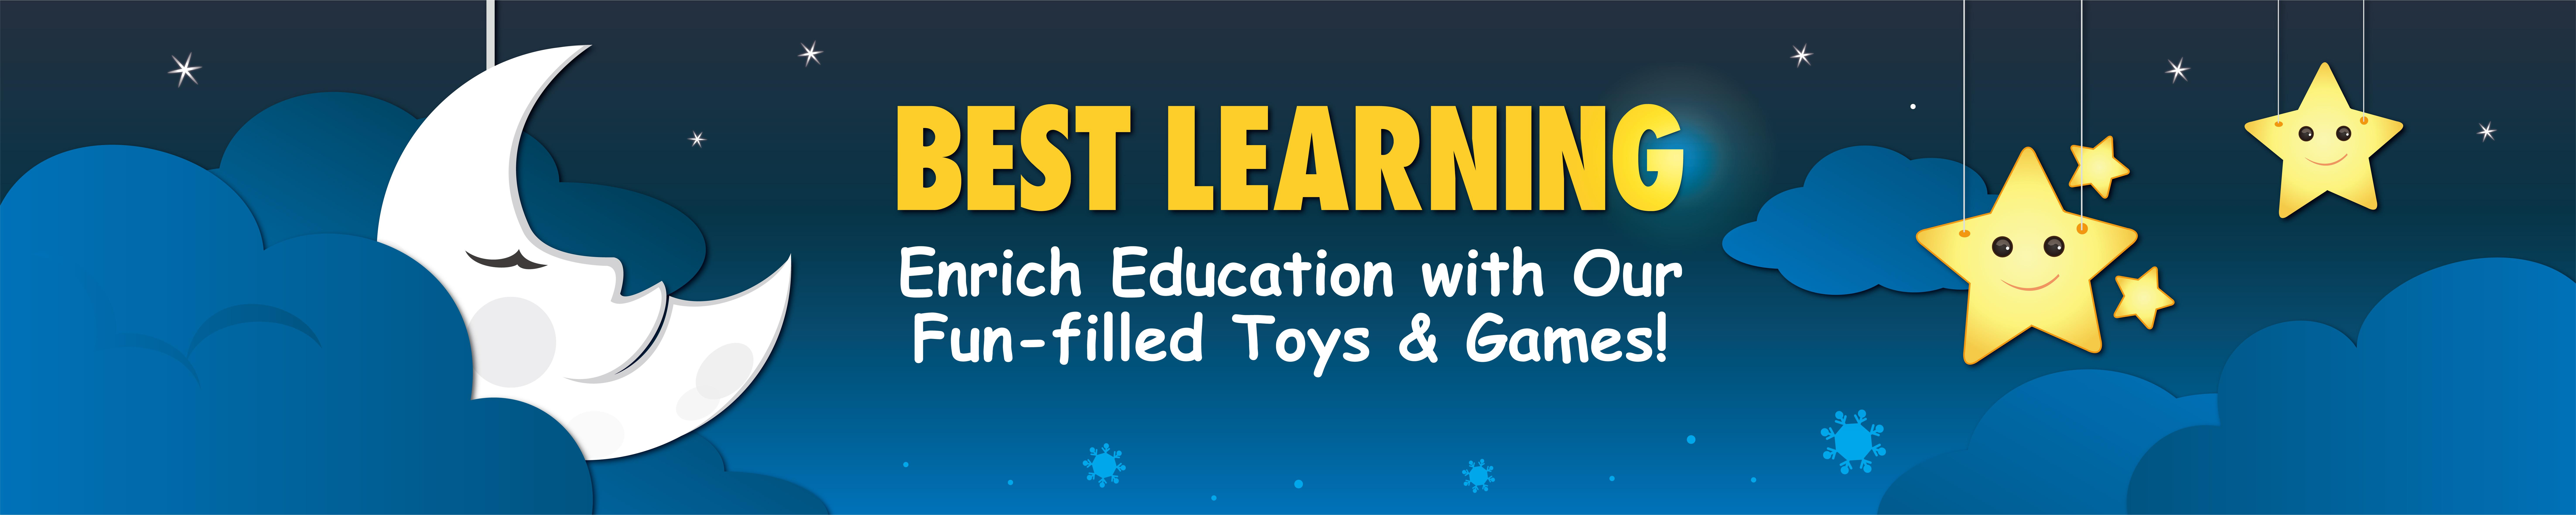 Amazon.com.au: BEST LEARNING: Learning Cube (6m+)